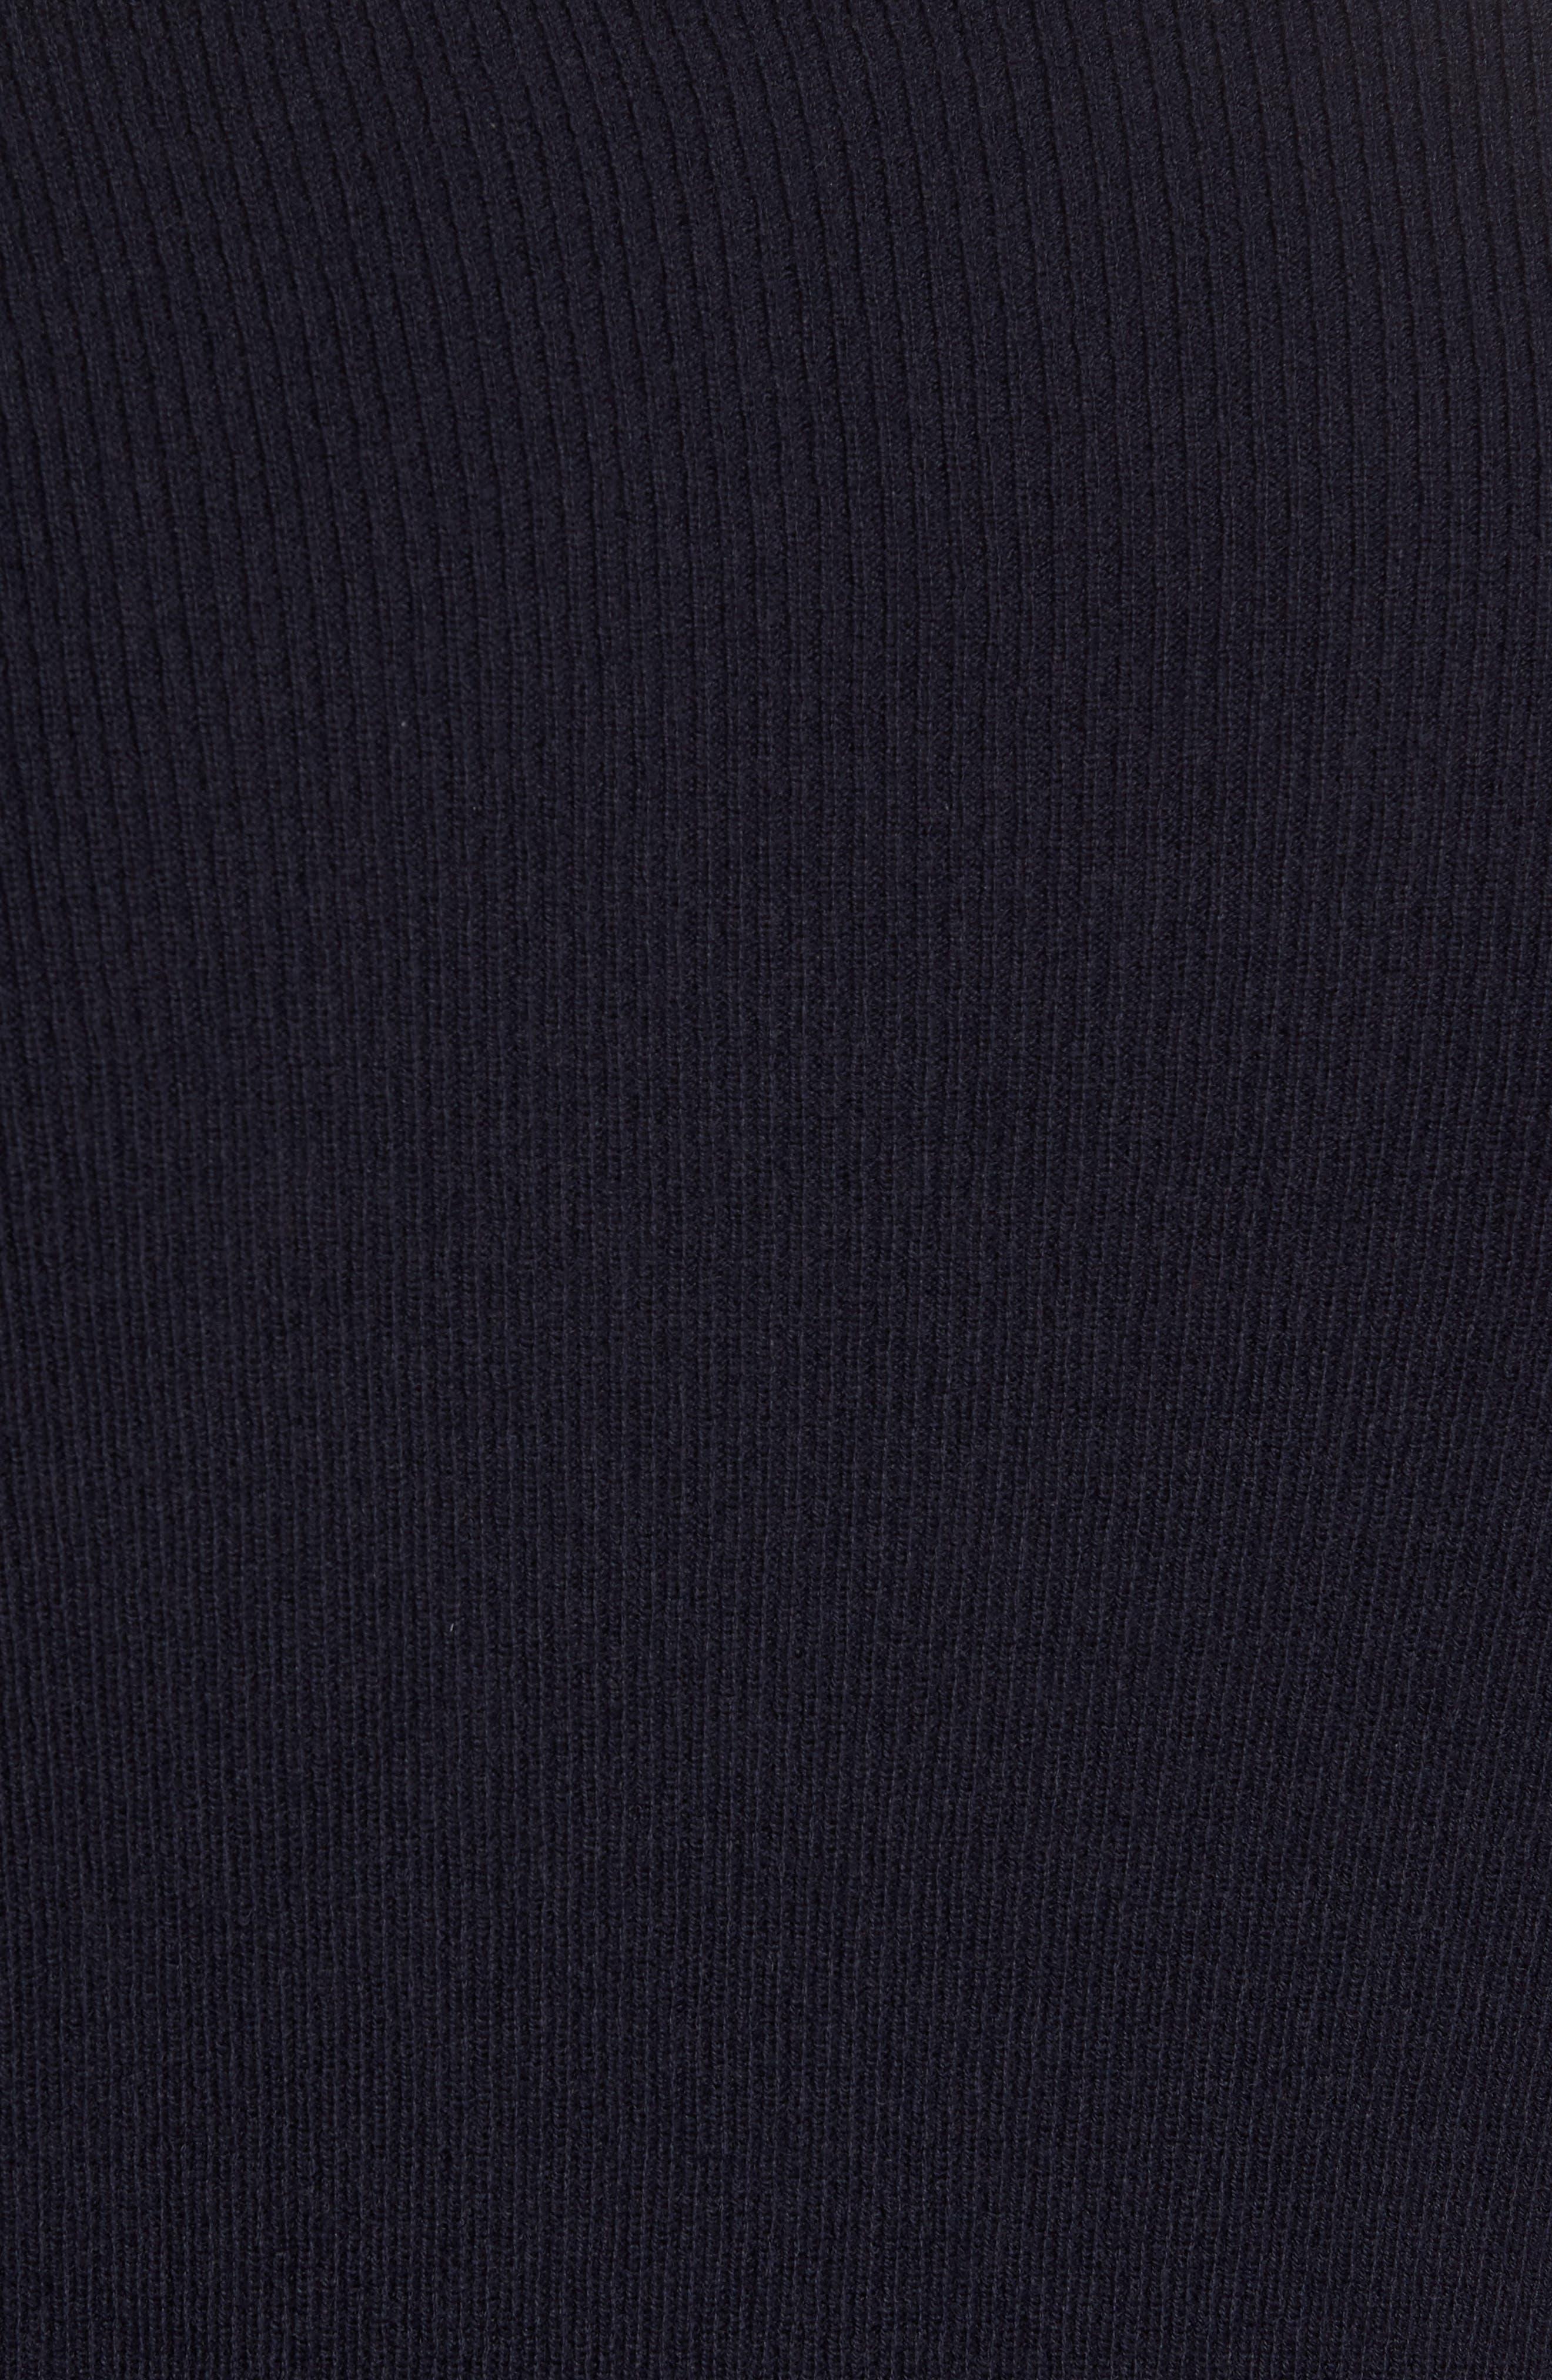 Colorblock Crewneck Sweater,                             Alternate thumbnail 5, color,                             410